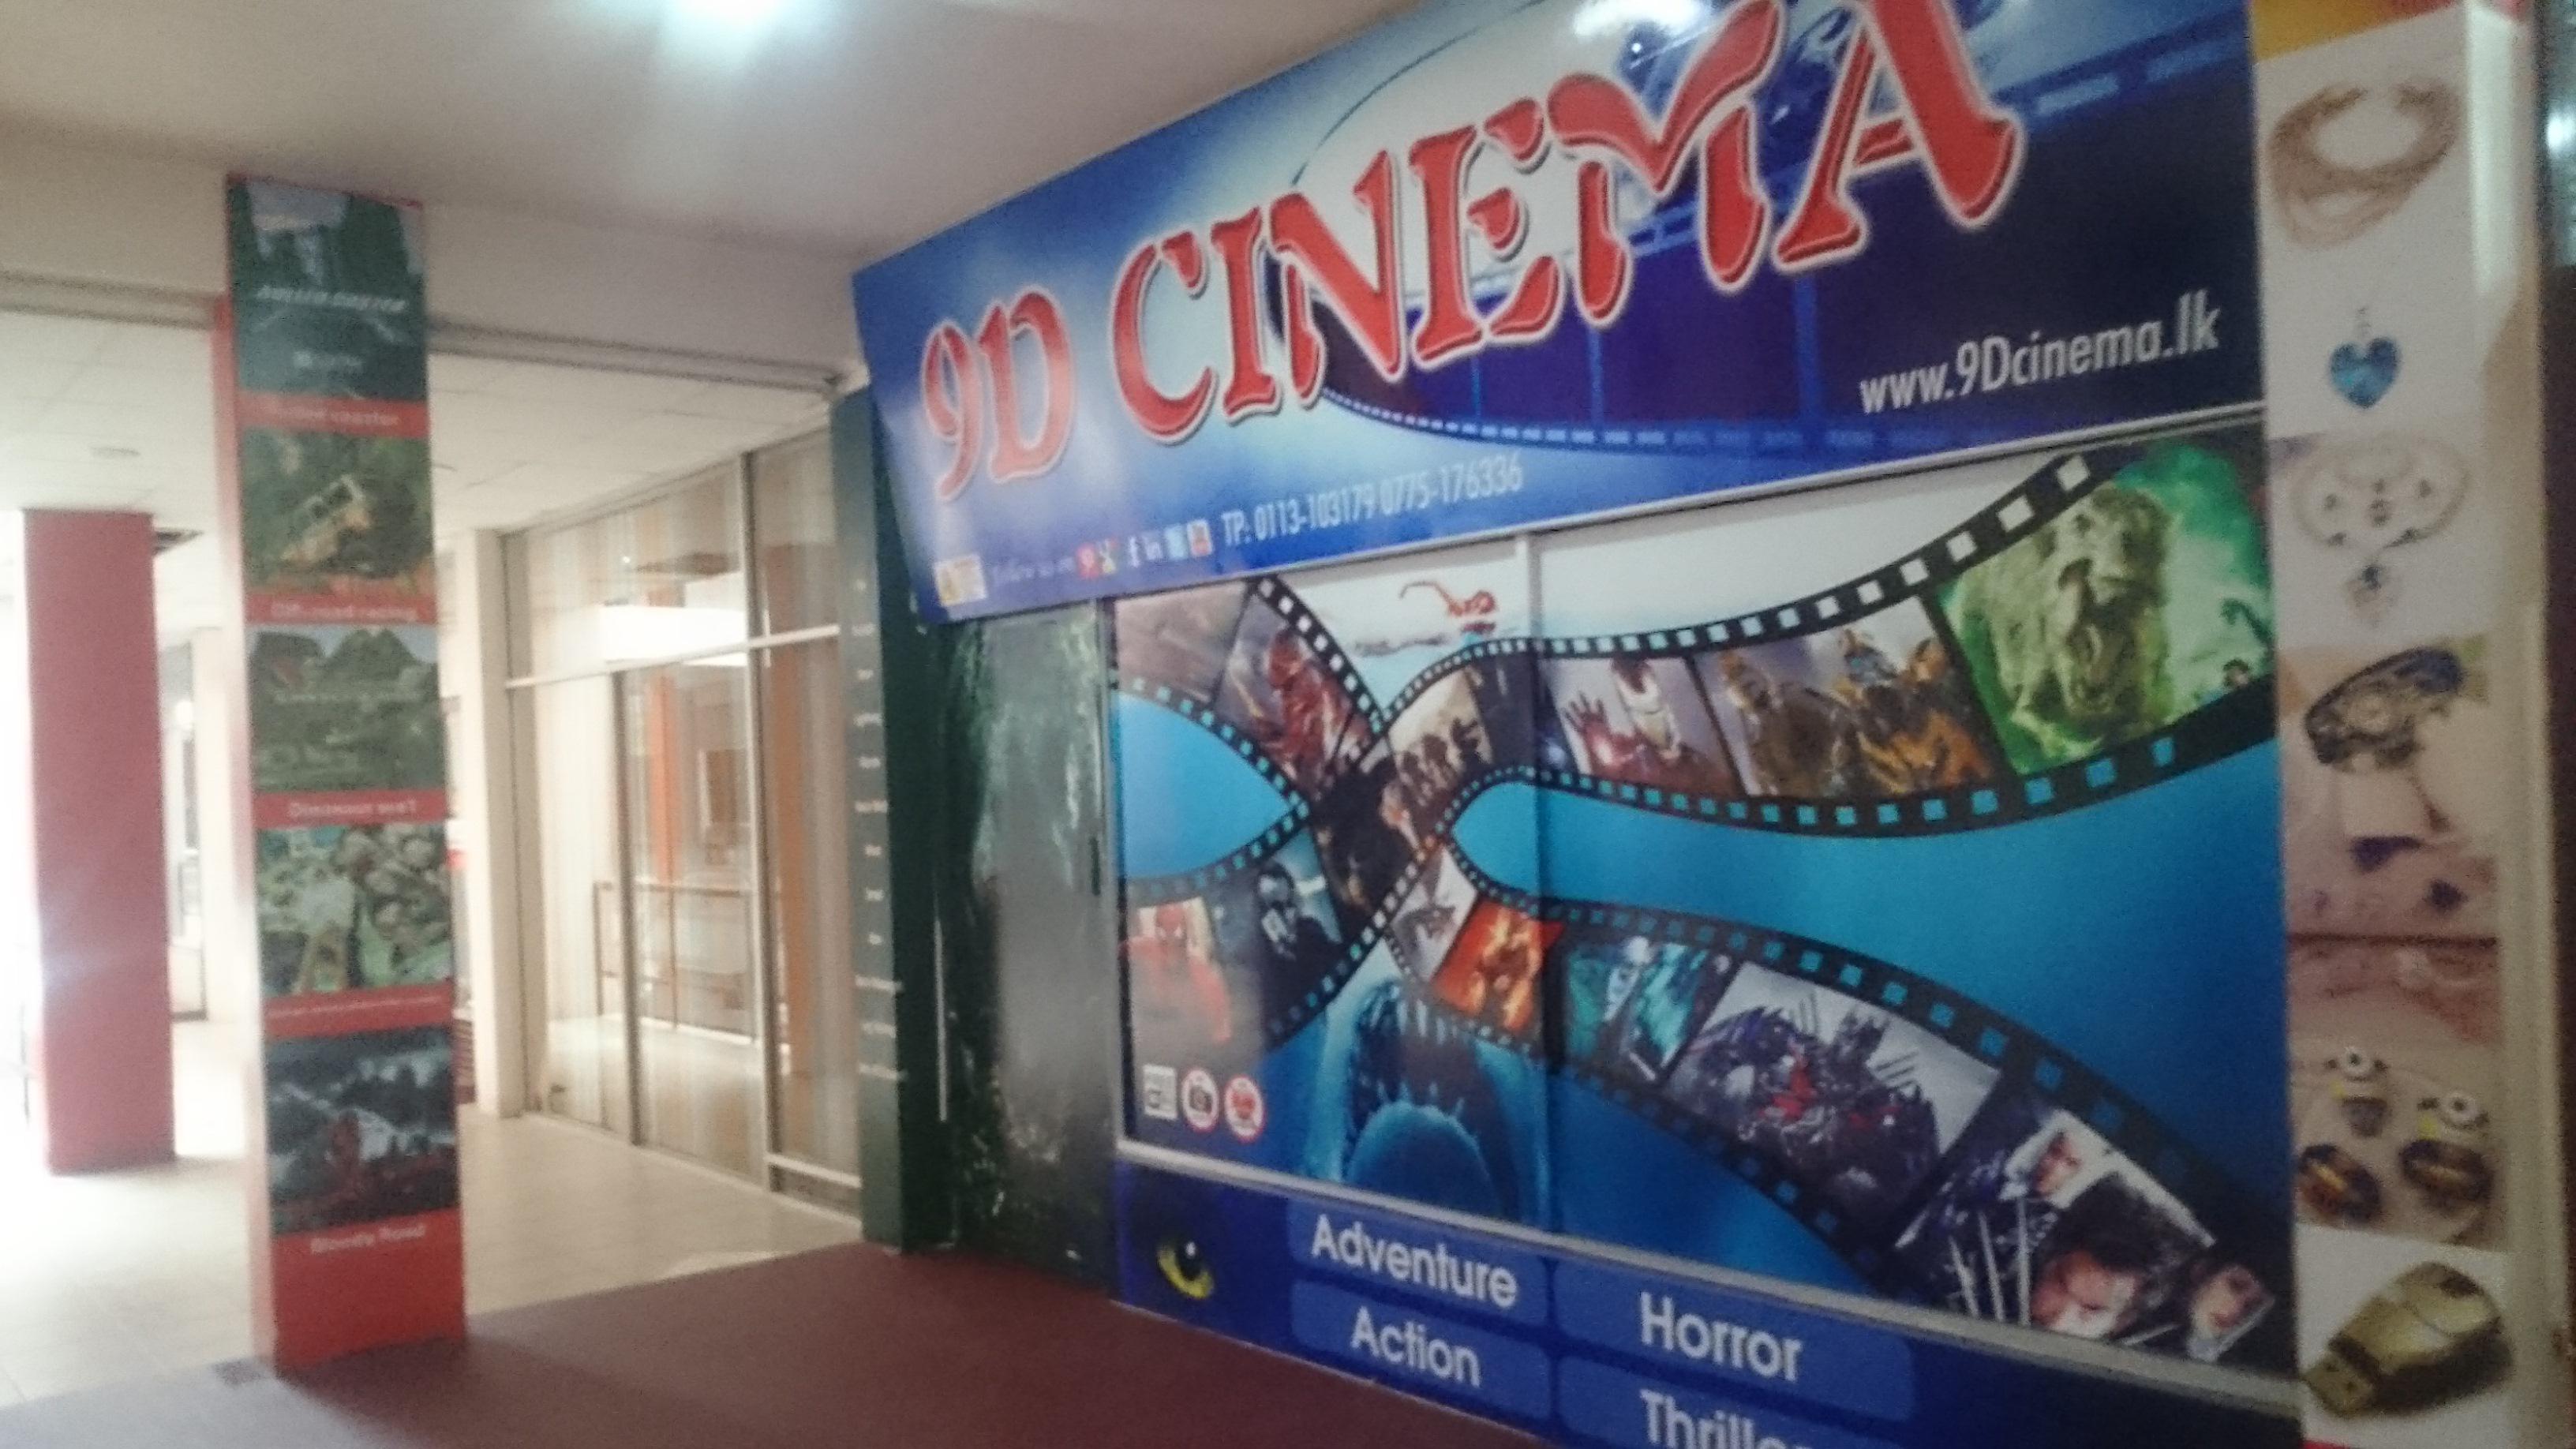 9D cinema maharagama SRILANKA